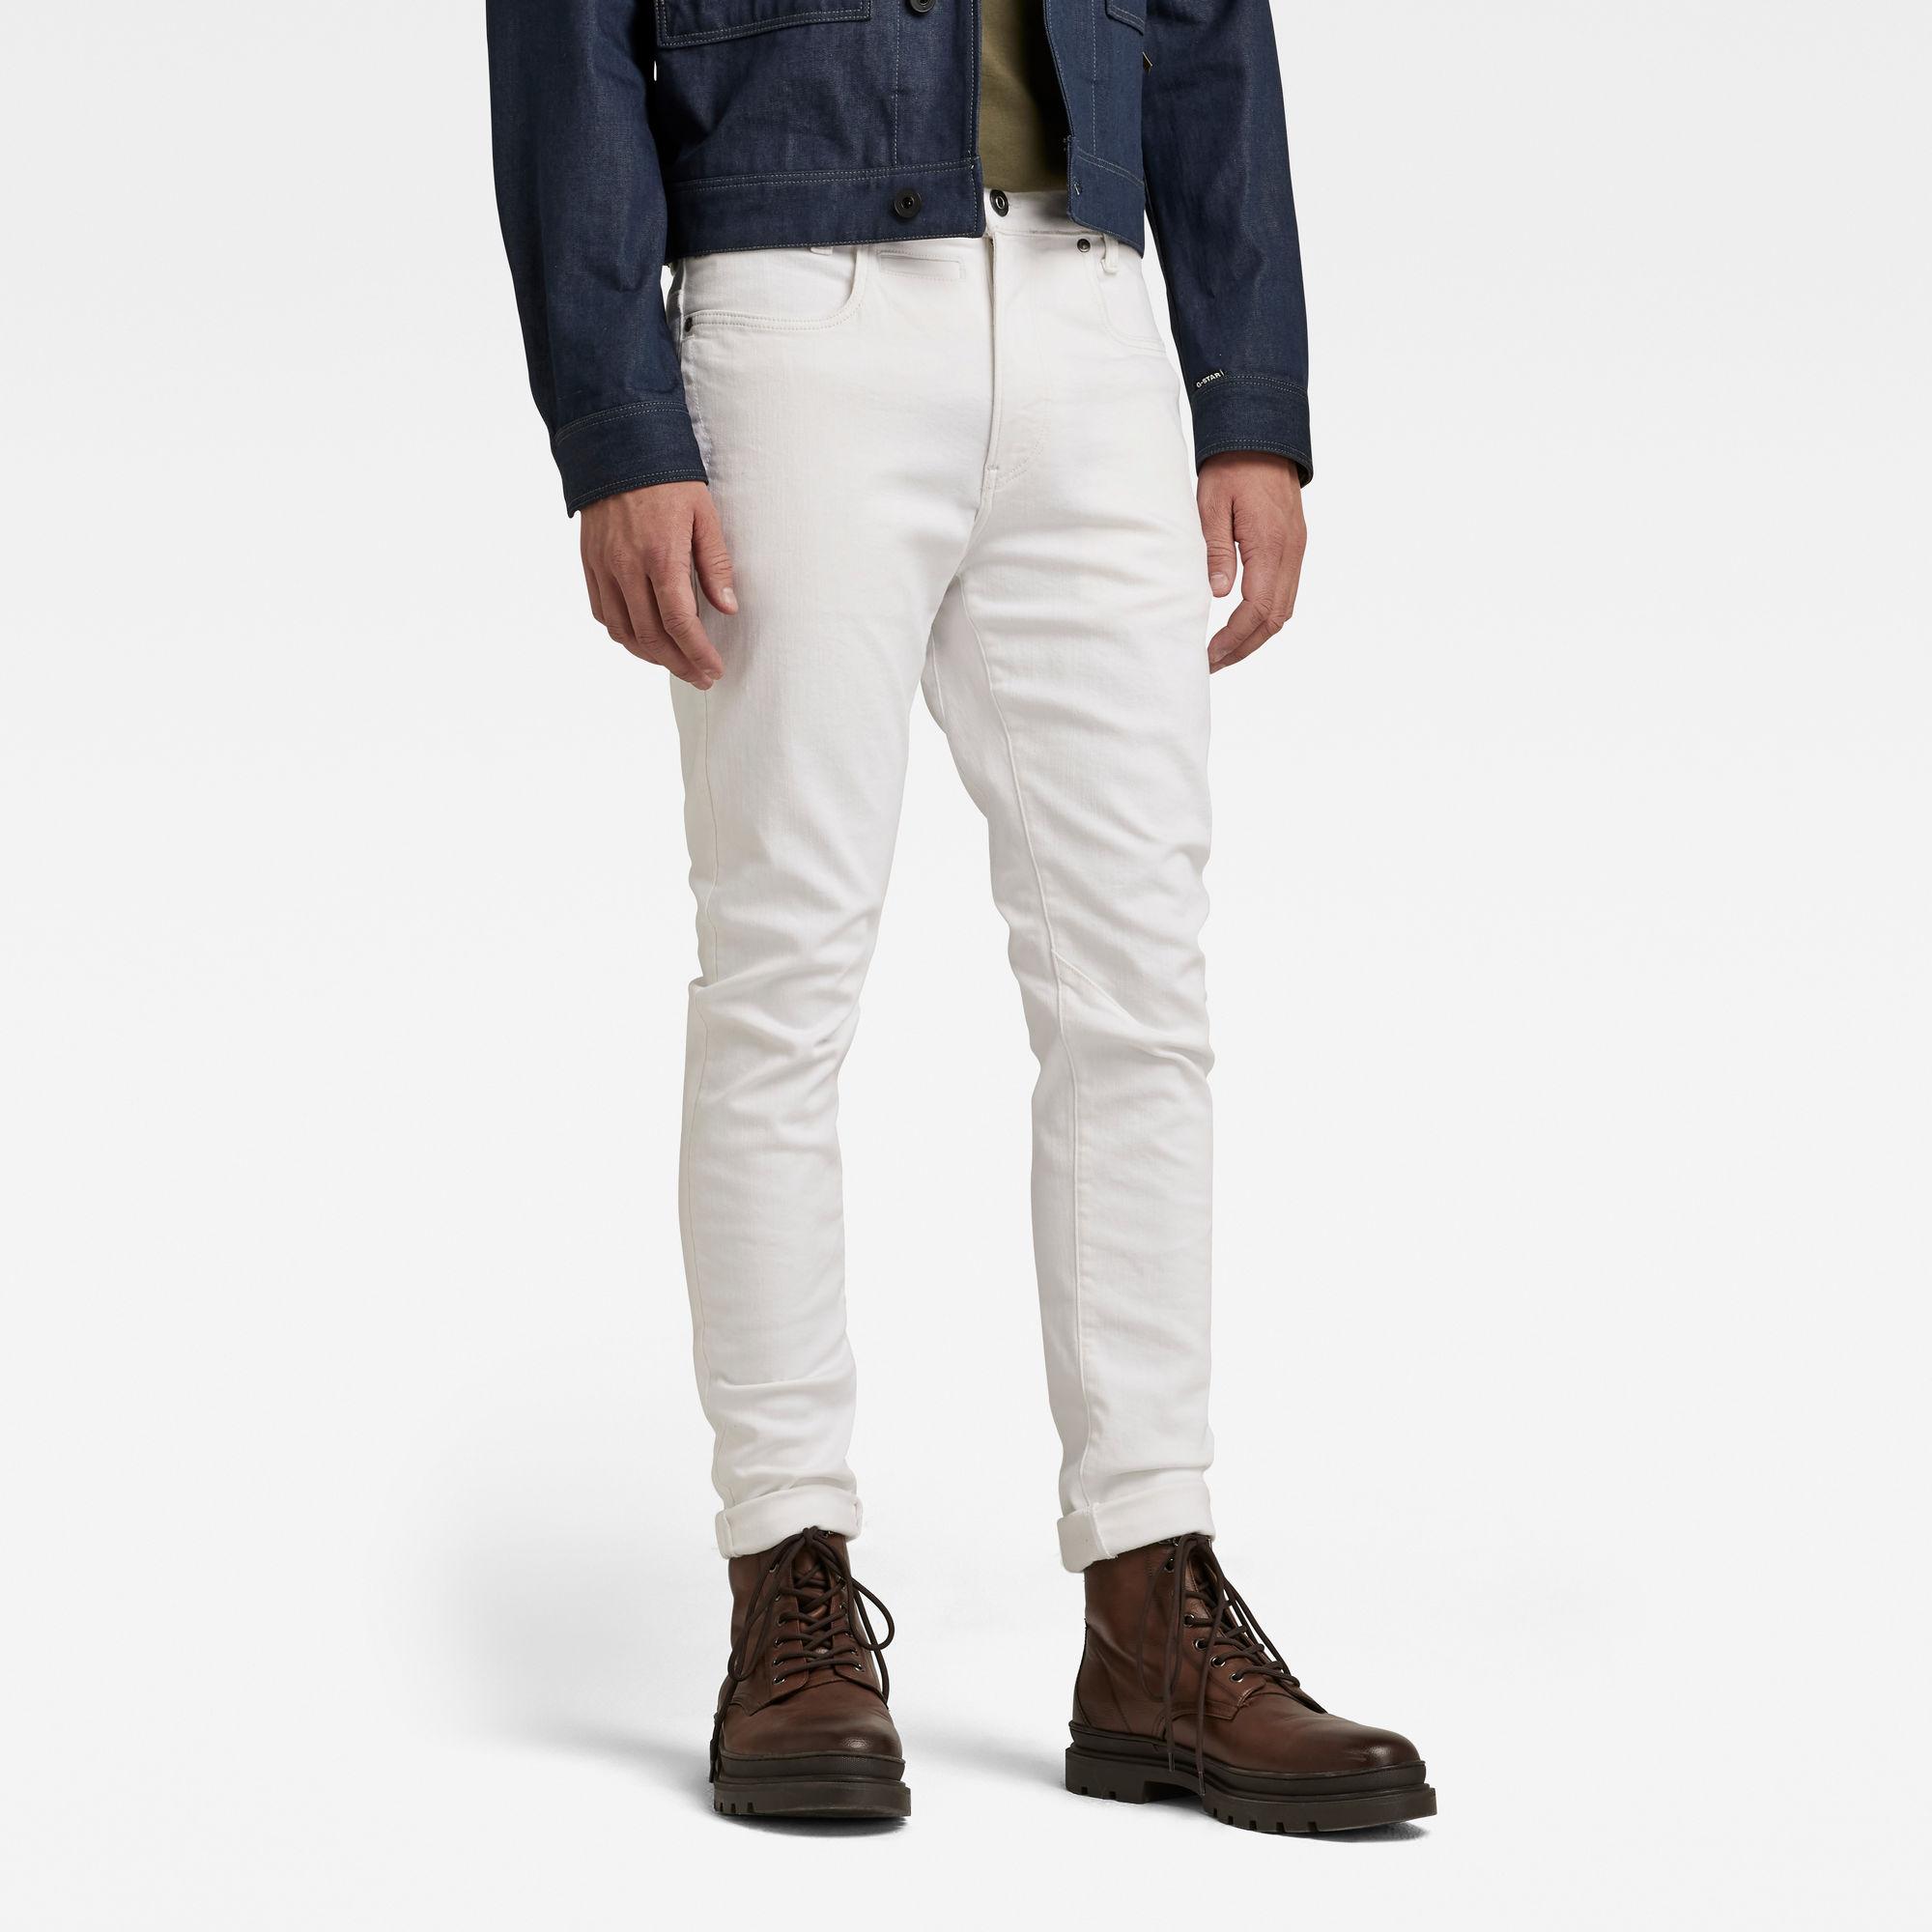 G-Star RAW Heren D-Staq 3D Slim Jeans Wit